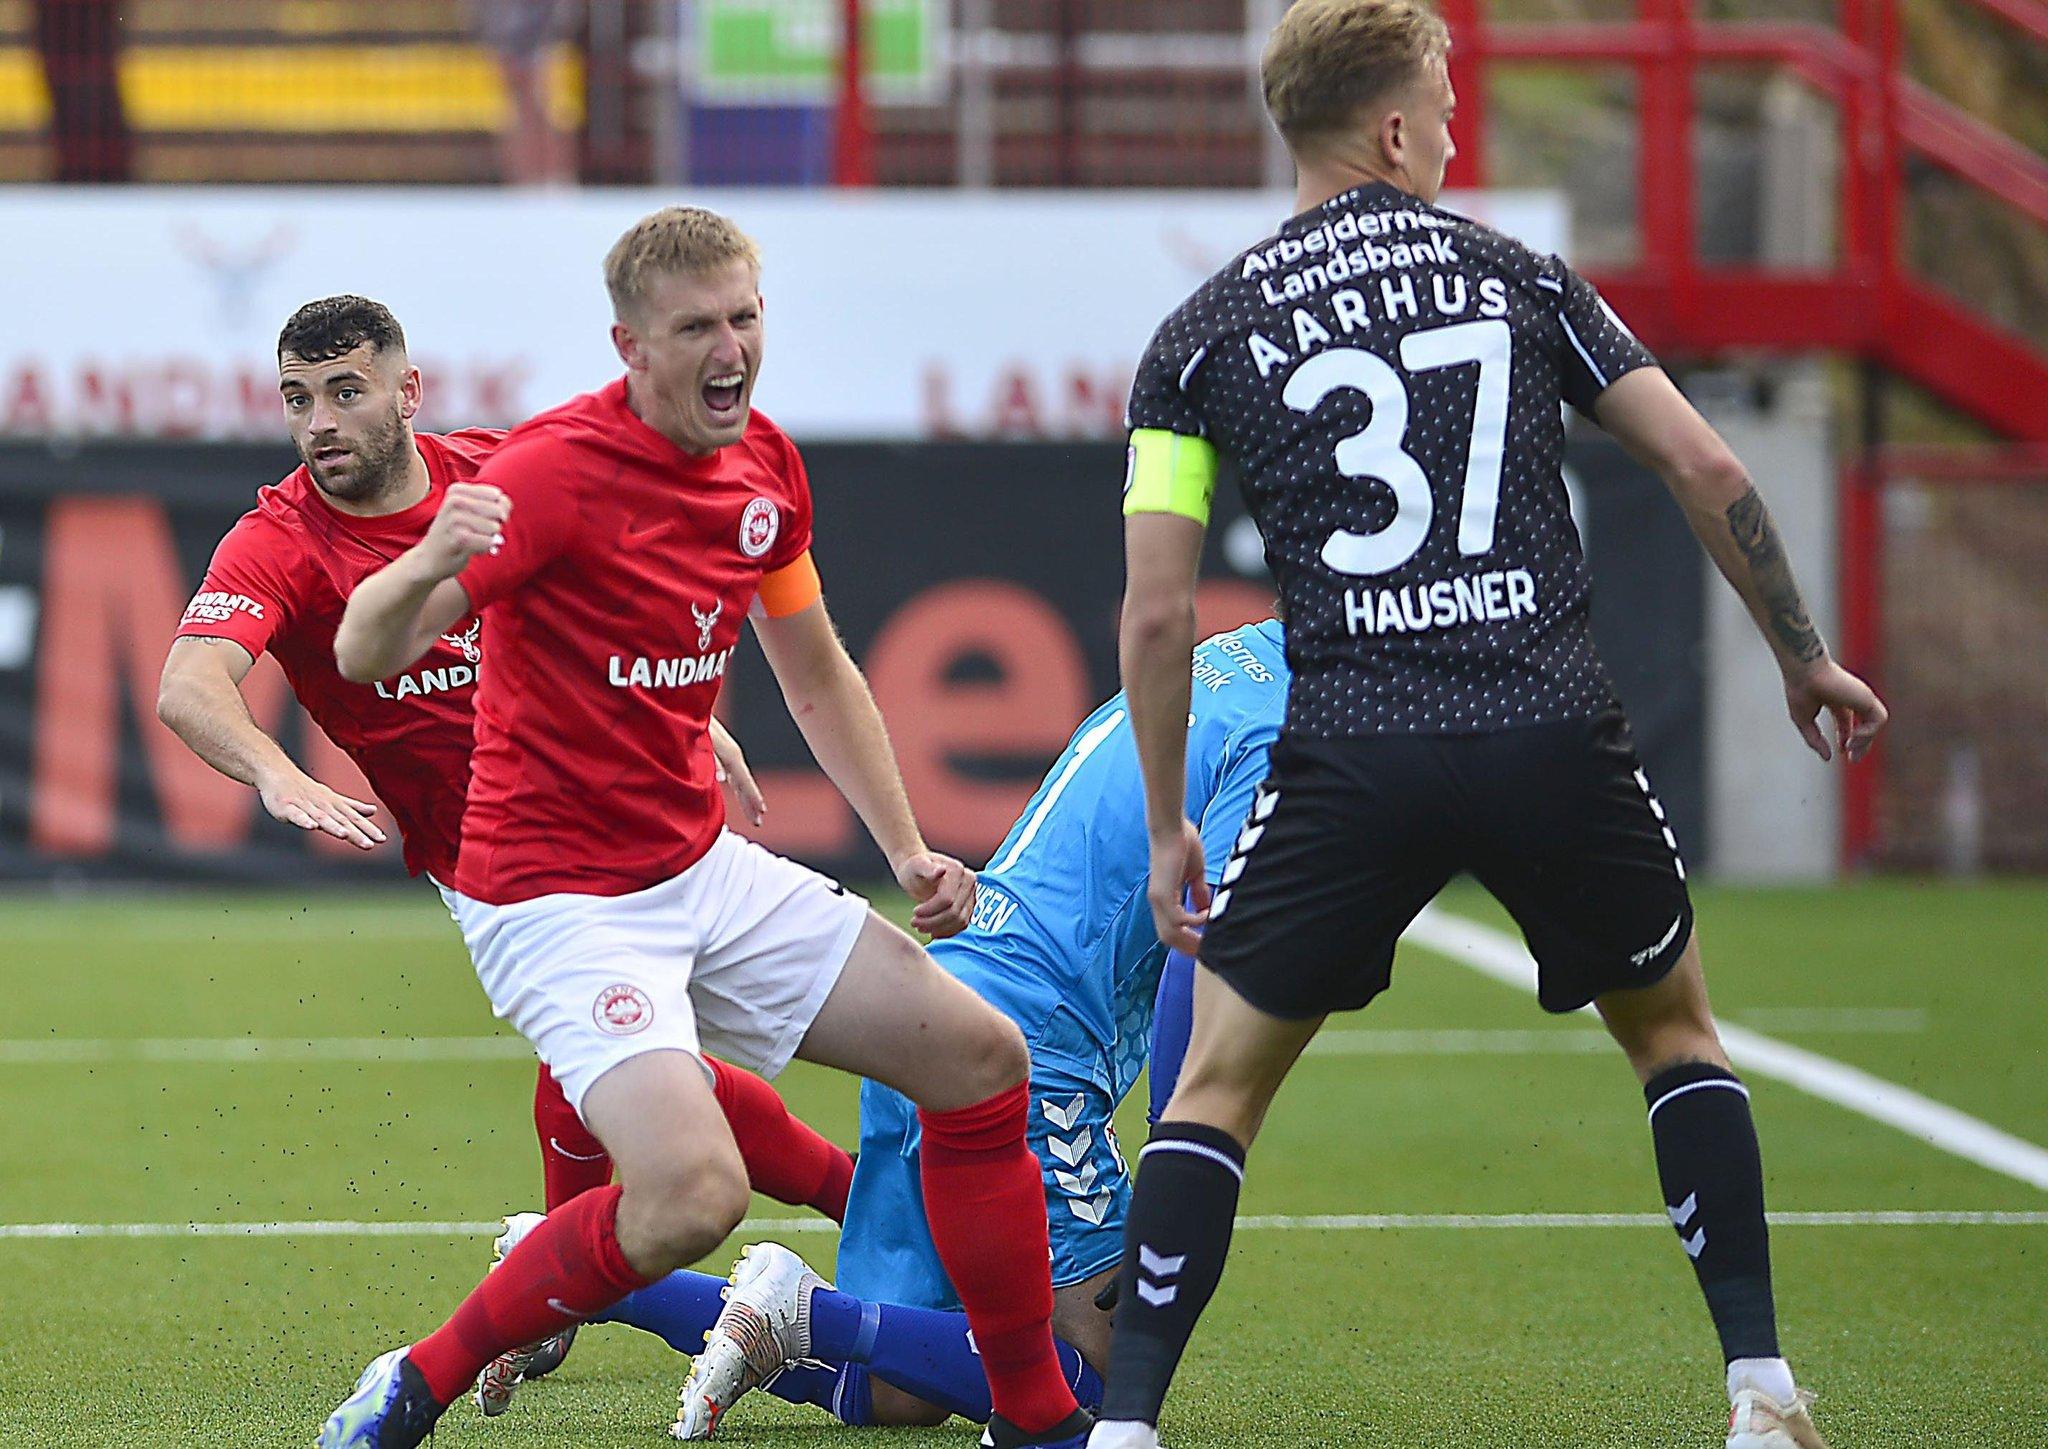 Larne's Danish delight to hold upper hand over Aarhus